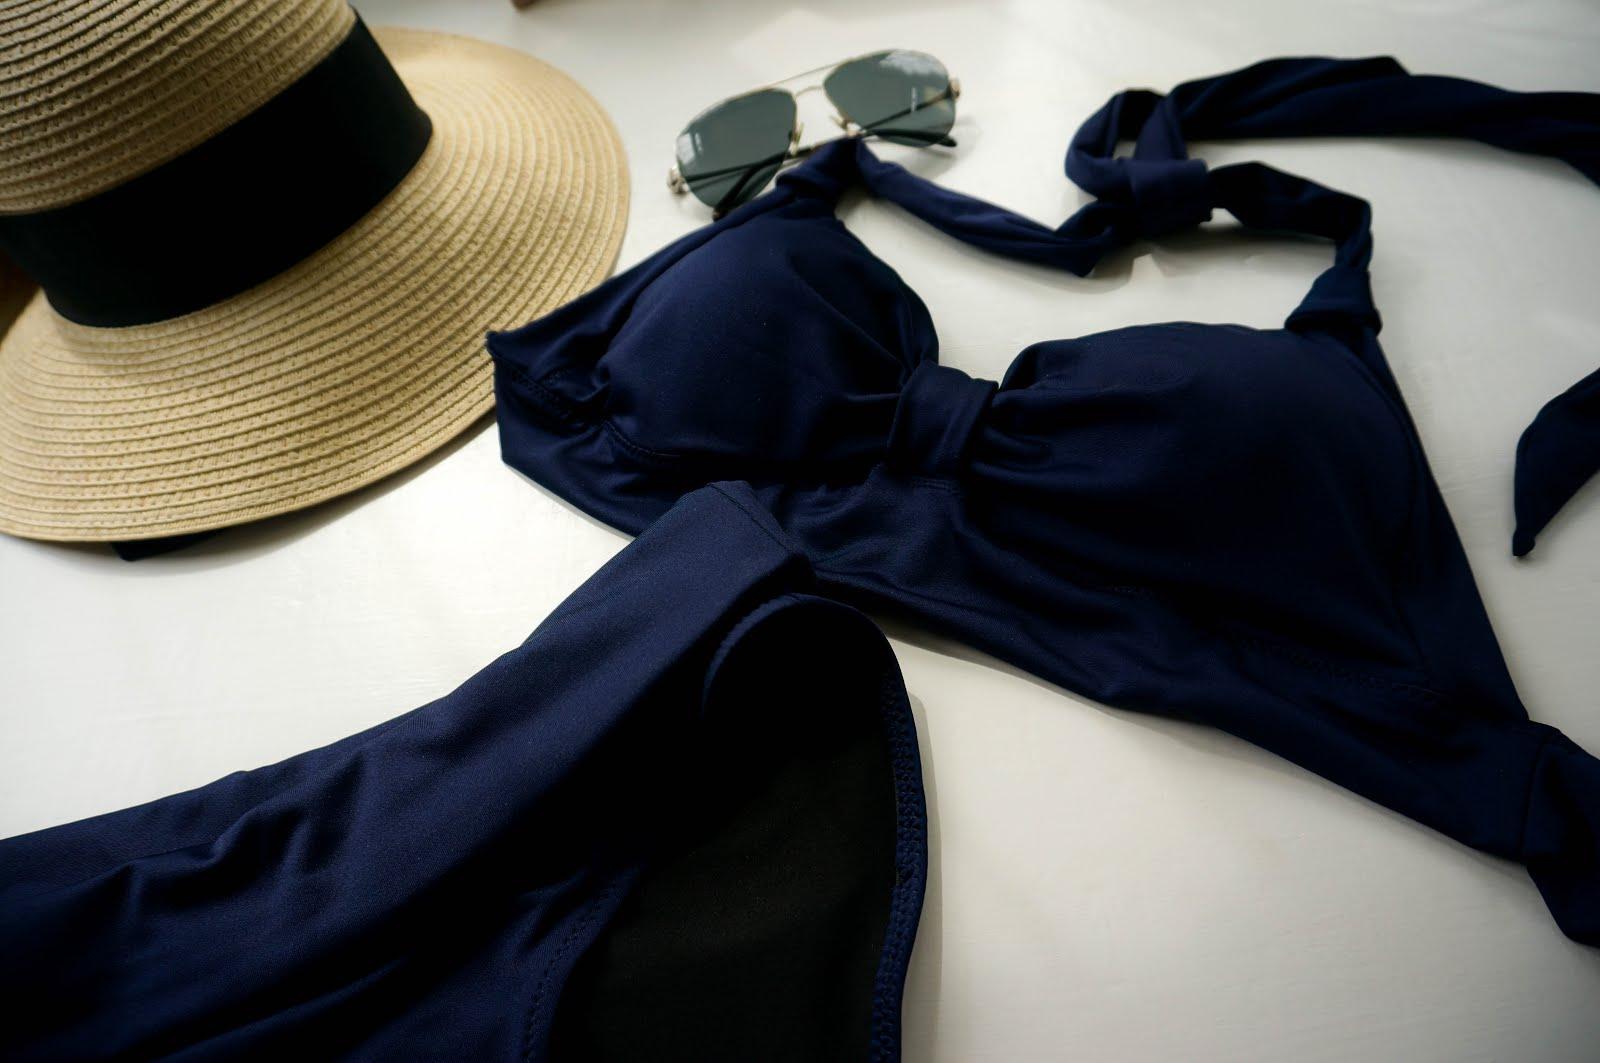 Sew your own swimwear